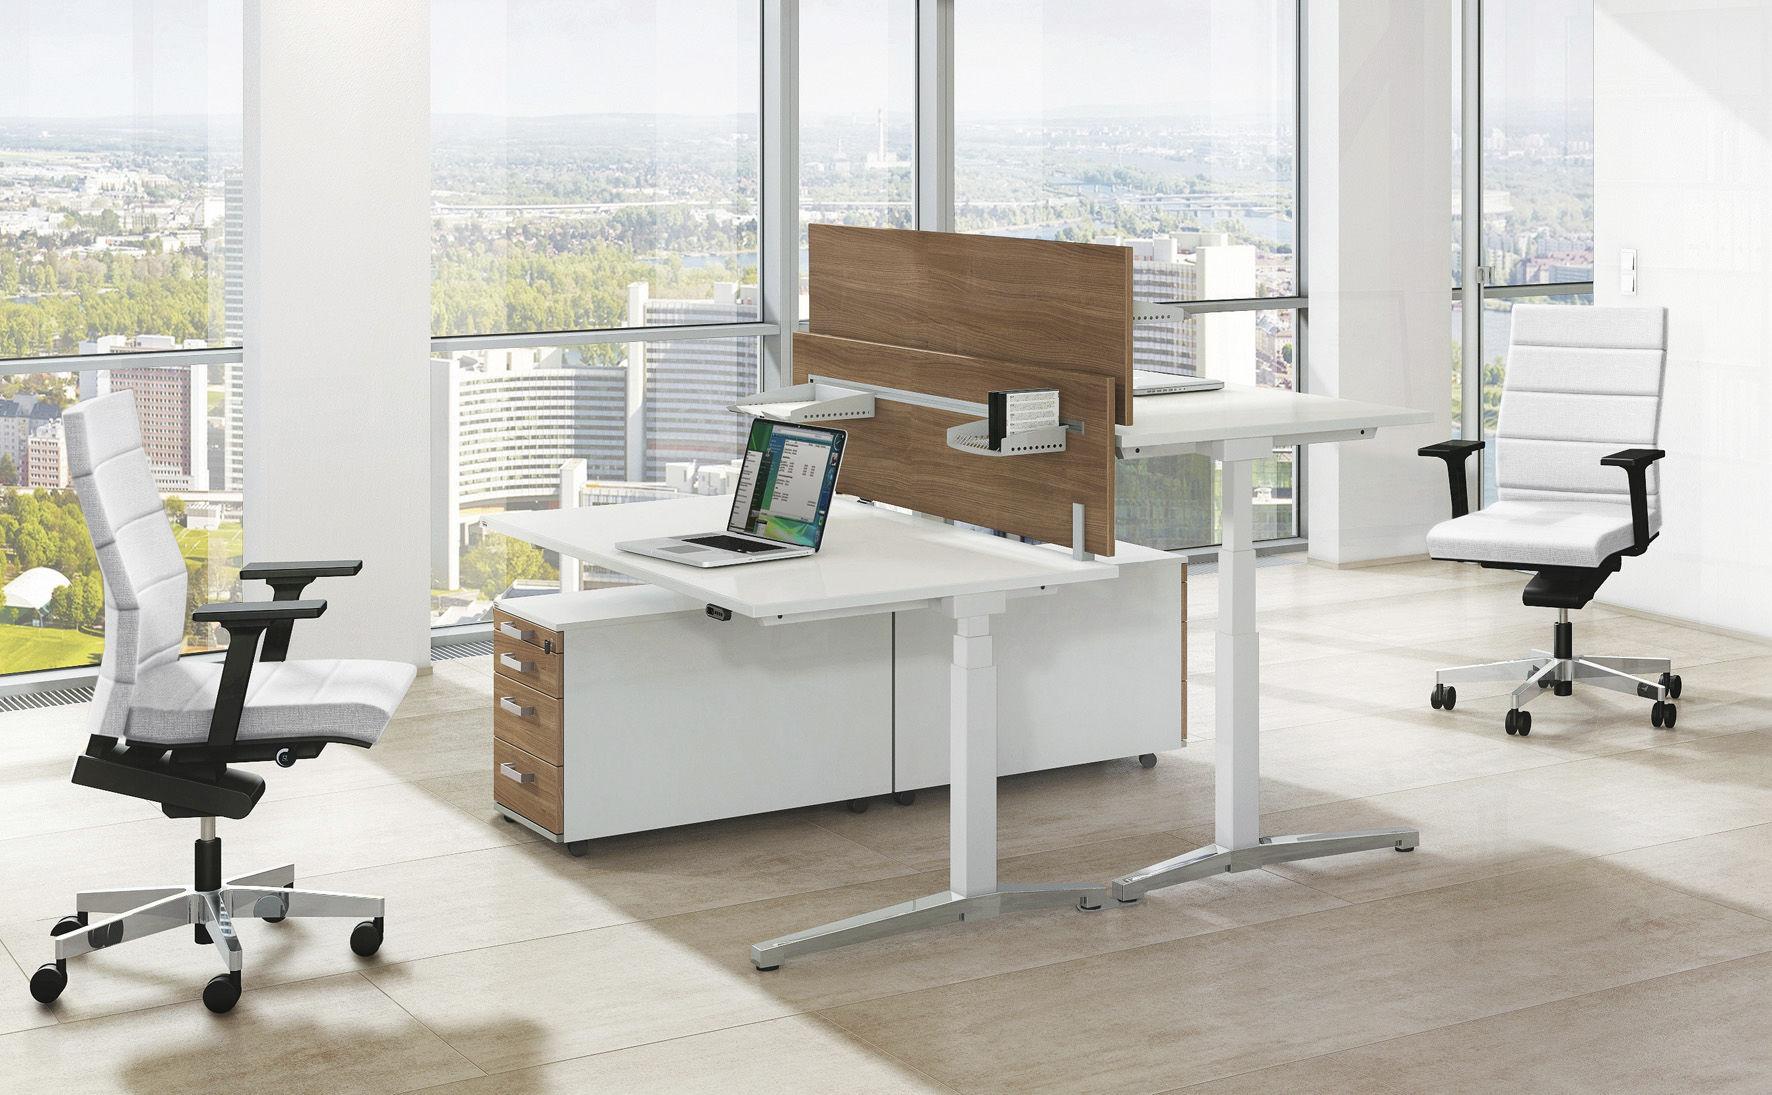 Büromöbel Design Holz | saigonford.info